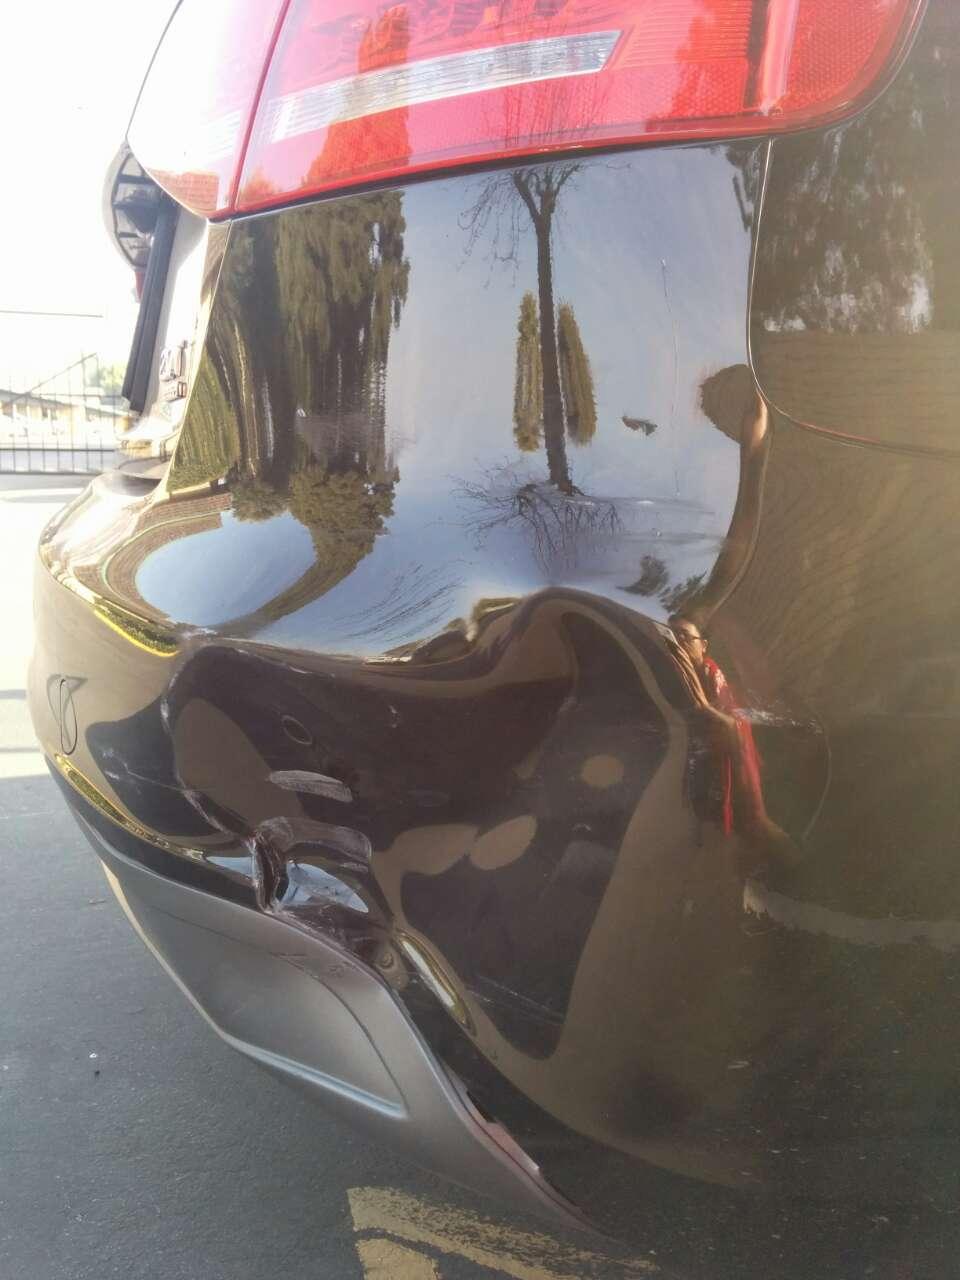 Rear bumper dent - estimate repair cost